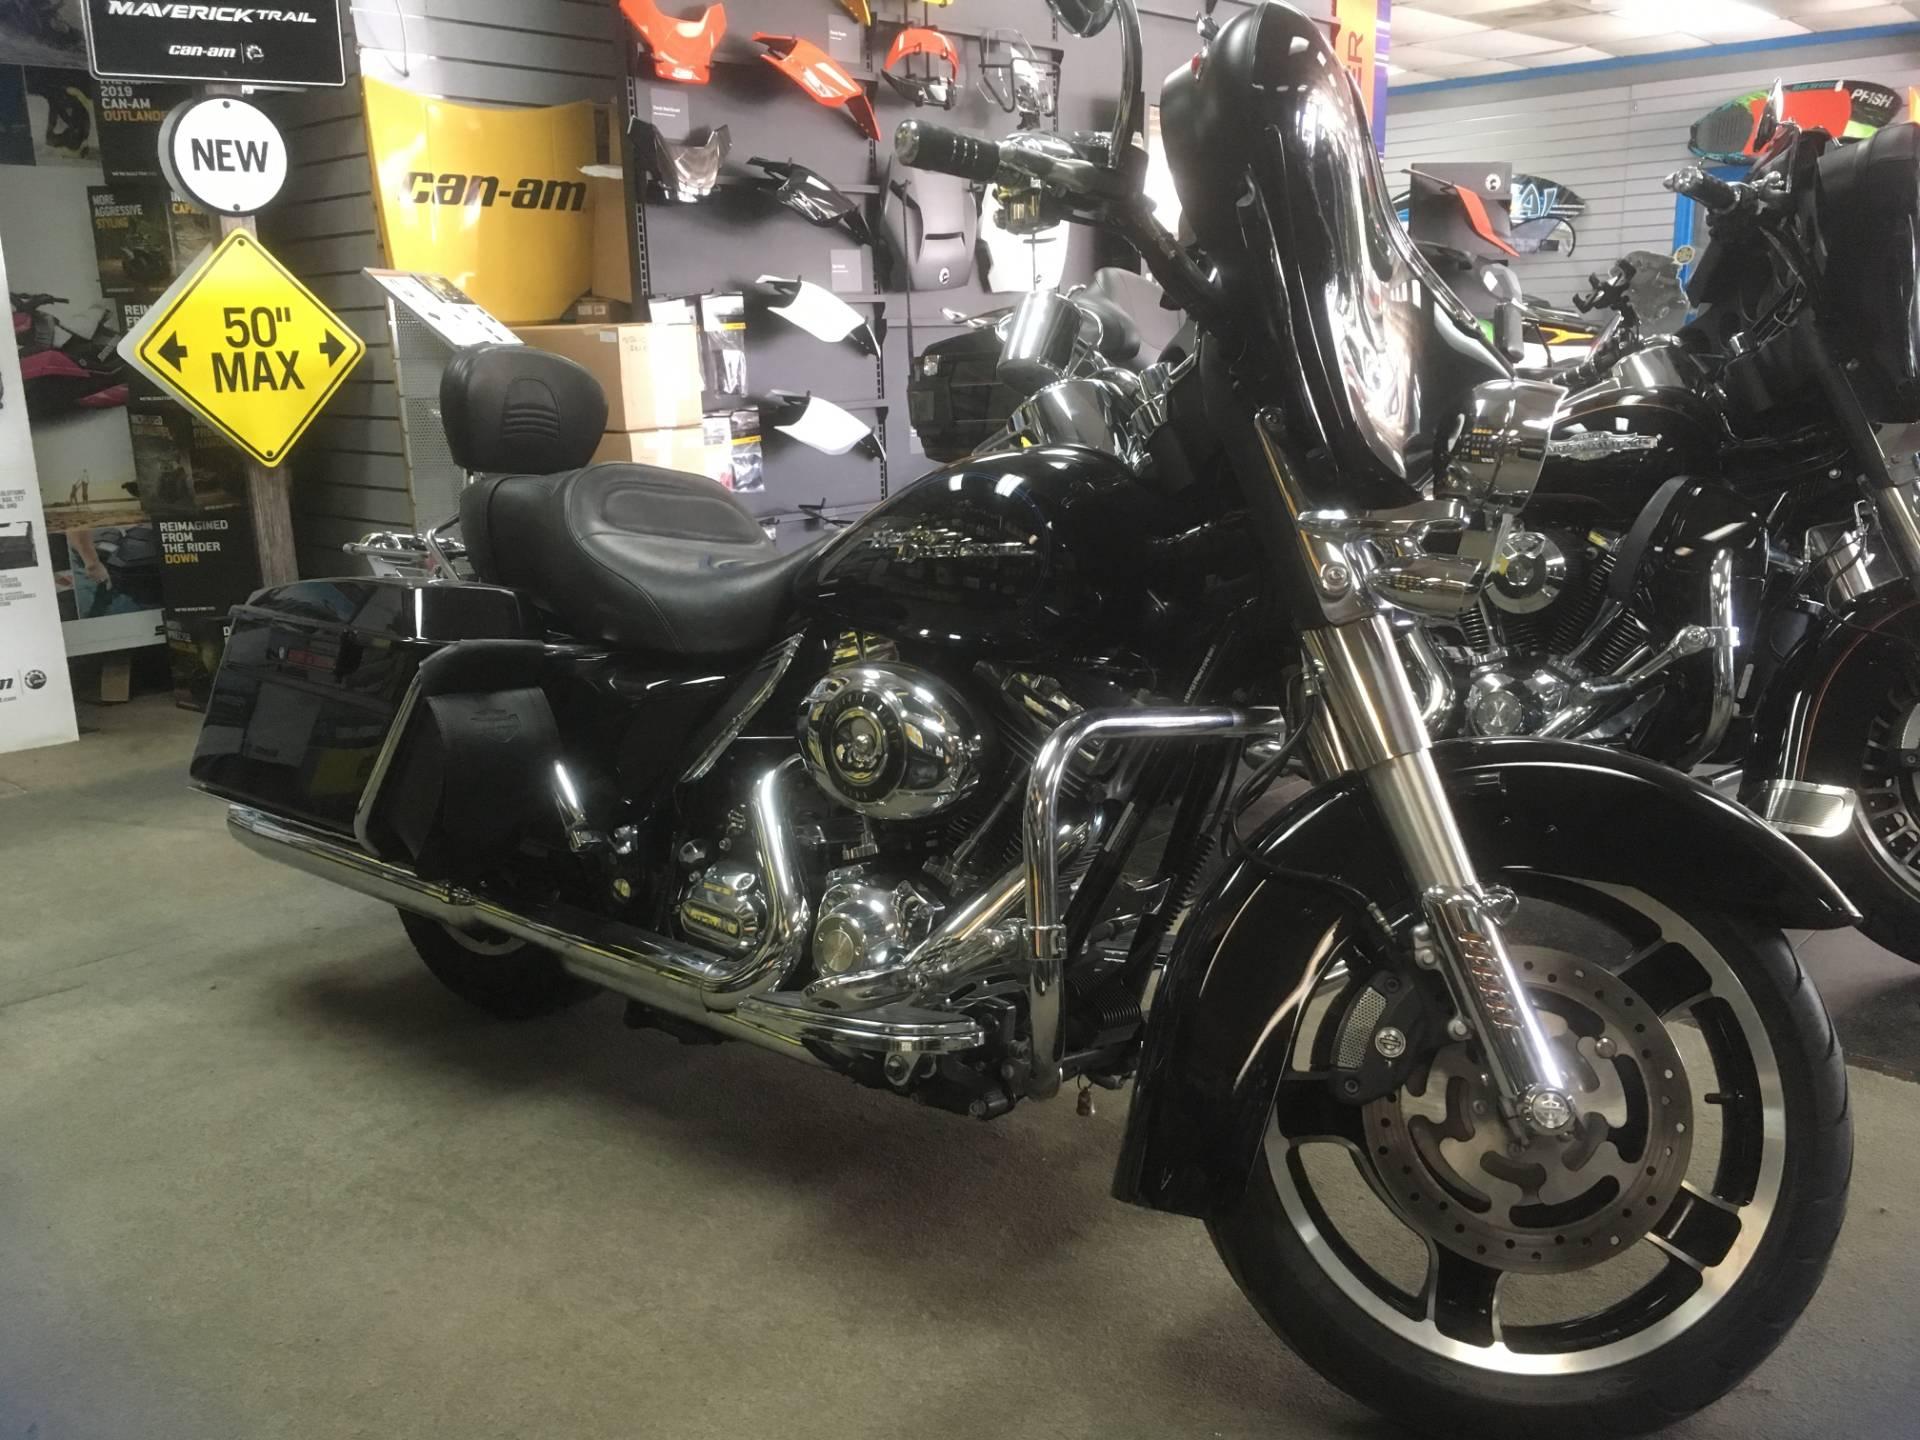 2010 Harley-Davidson FLHX STREET GLIDE 3